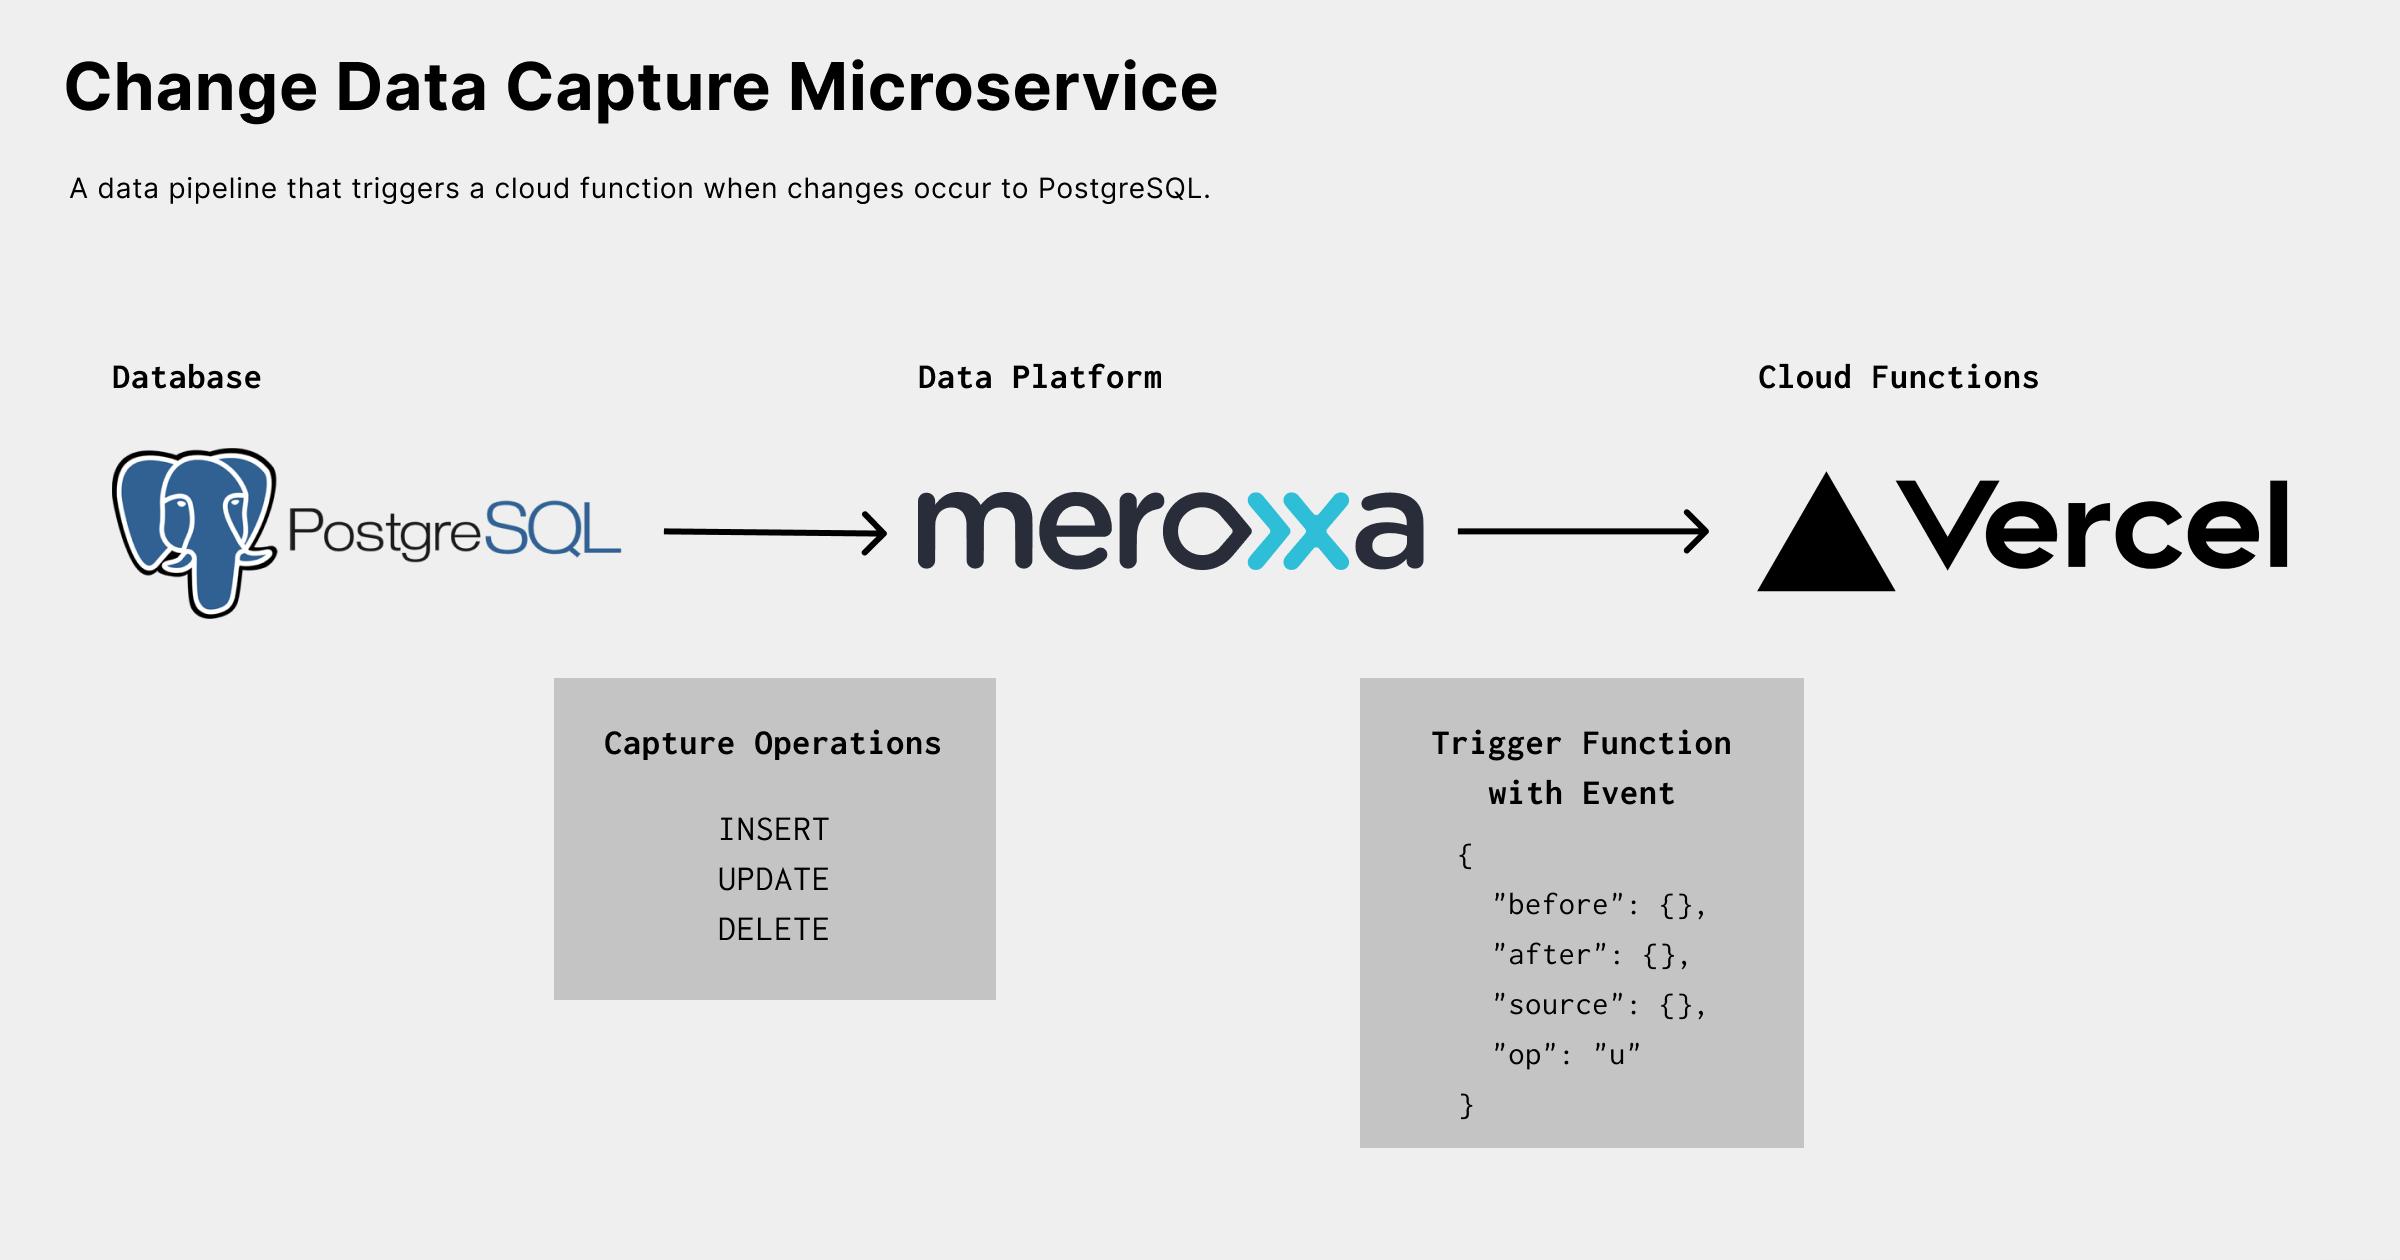 Change Data Capture Microservice